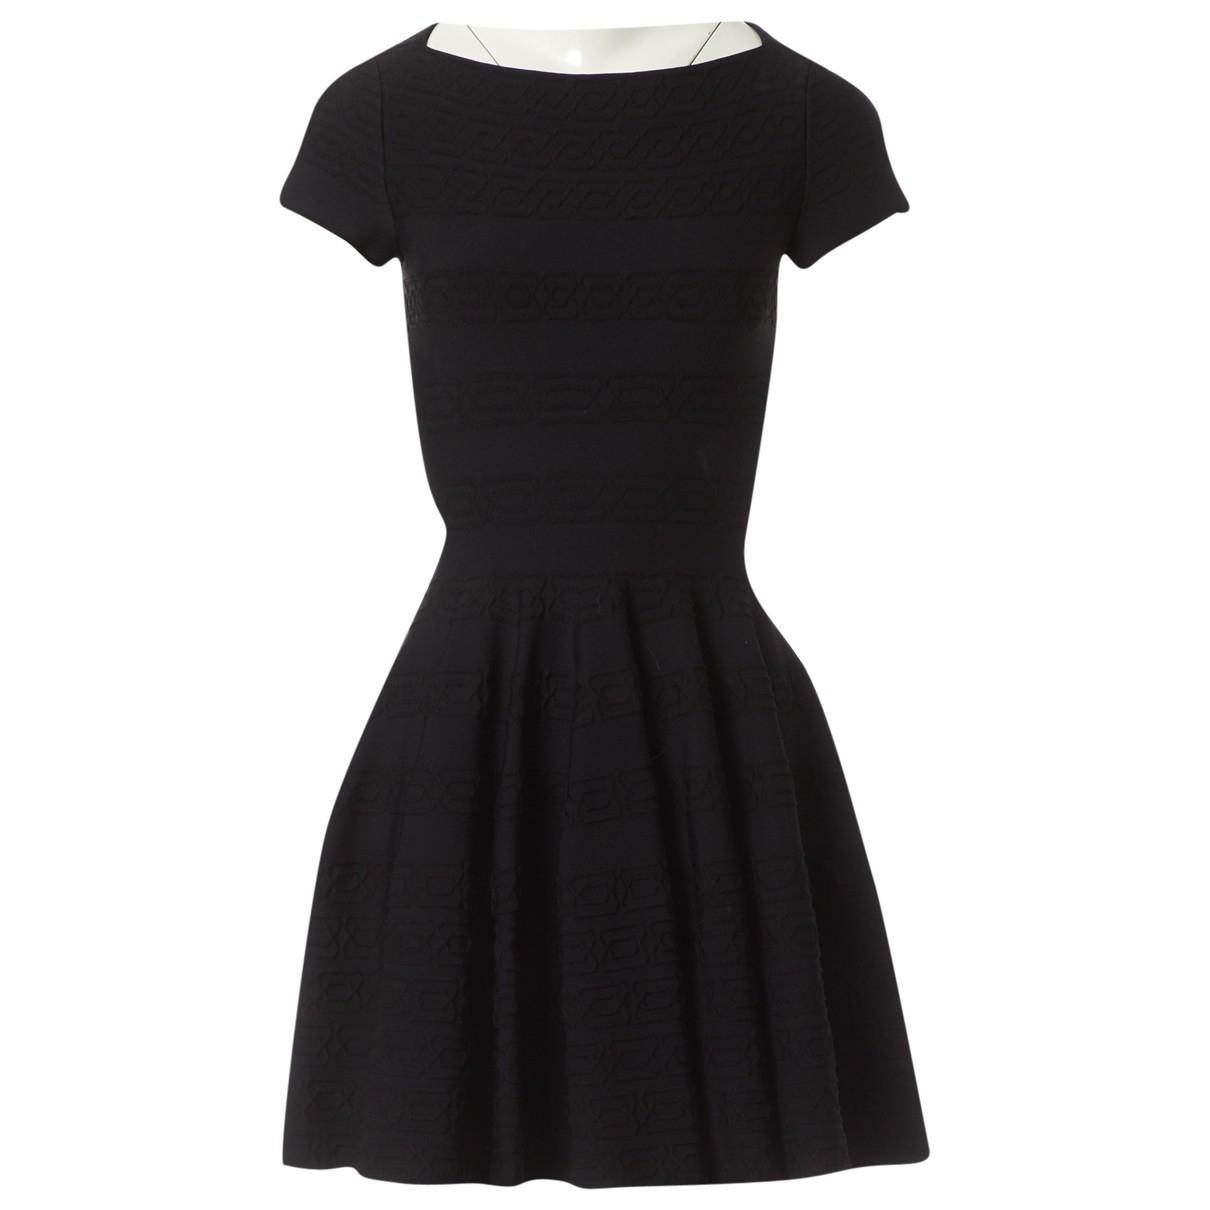 Alaïa \N Black dress for Women 38 FR